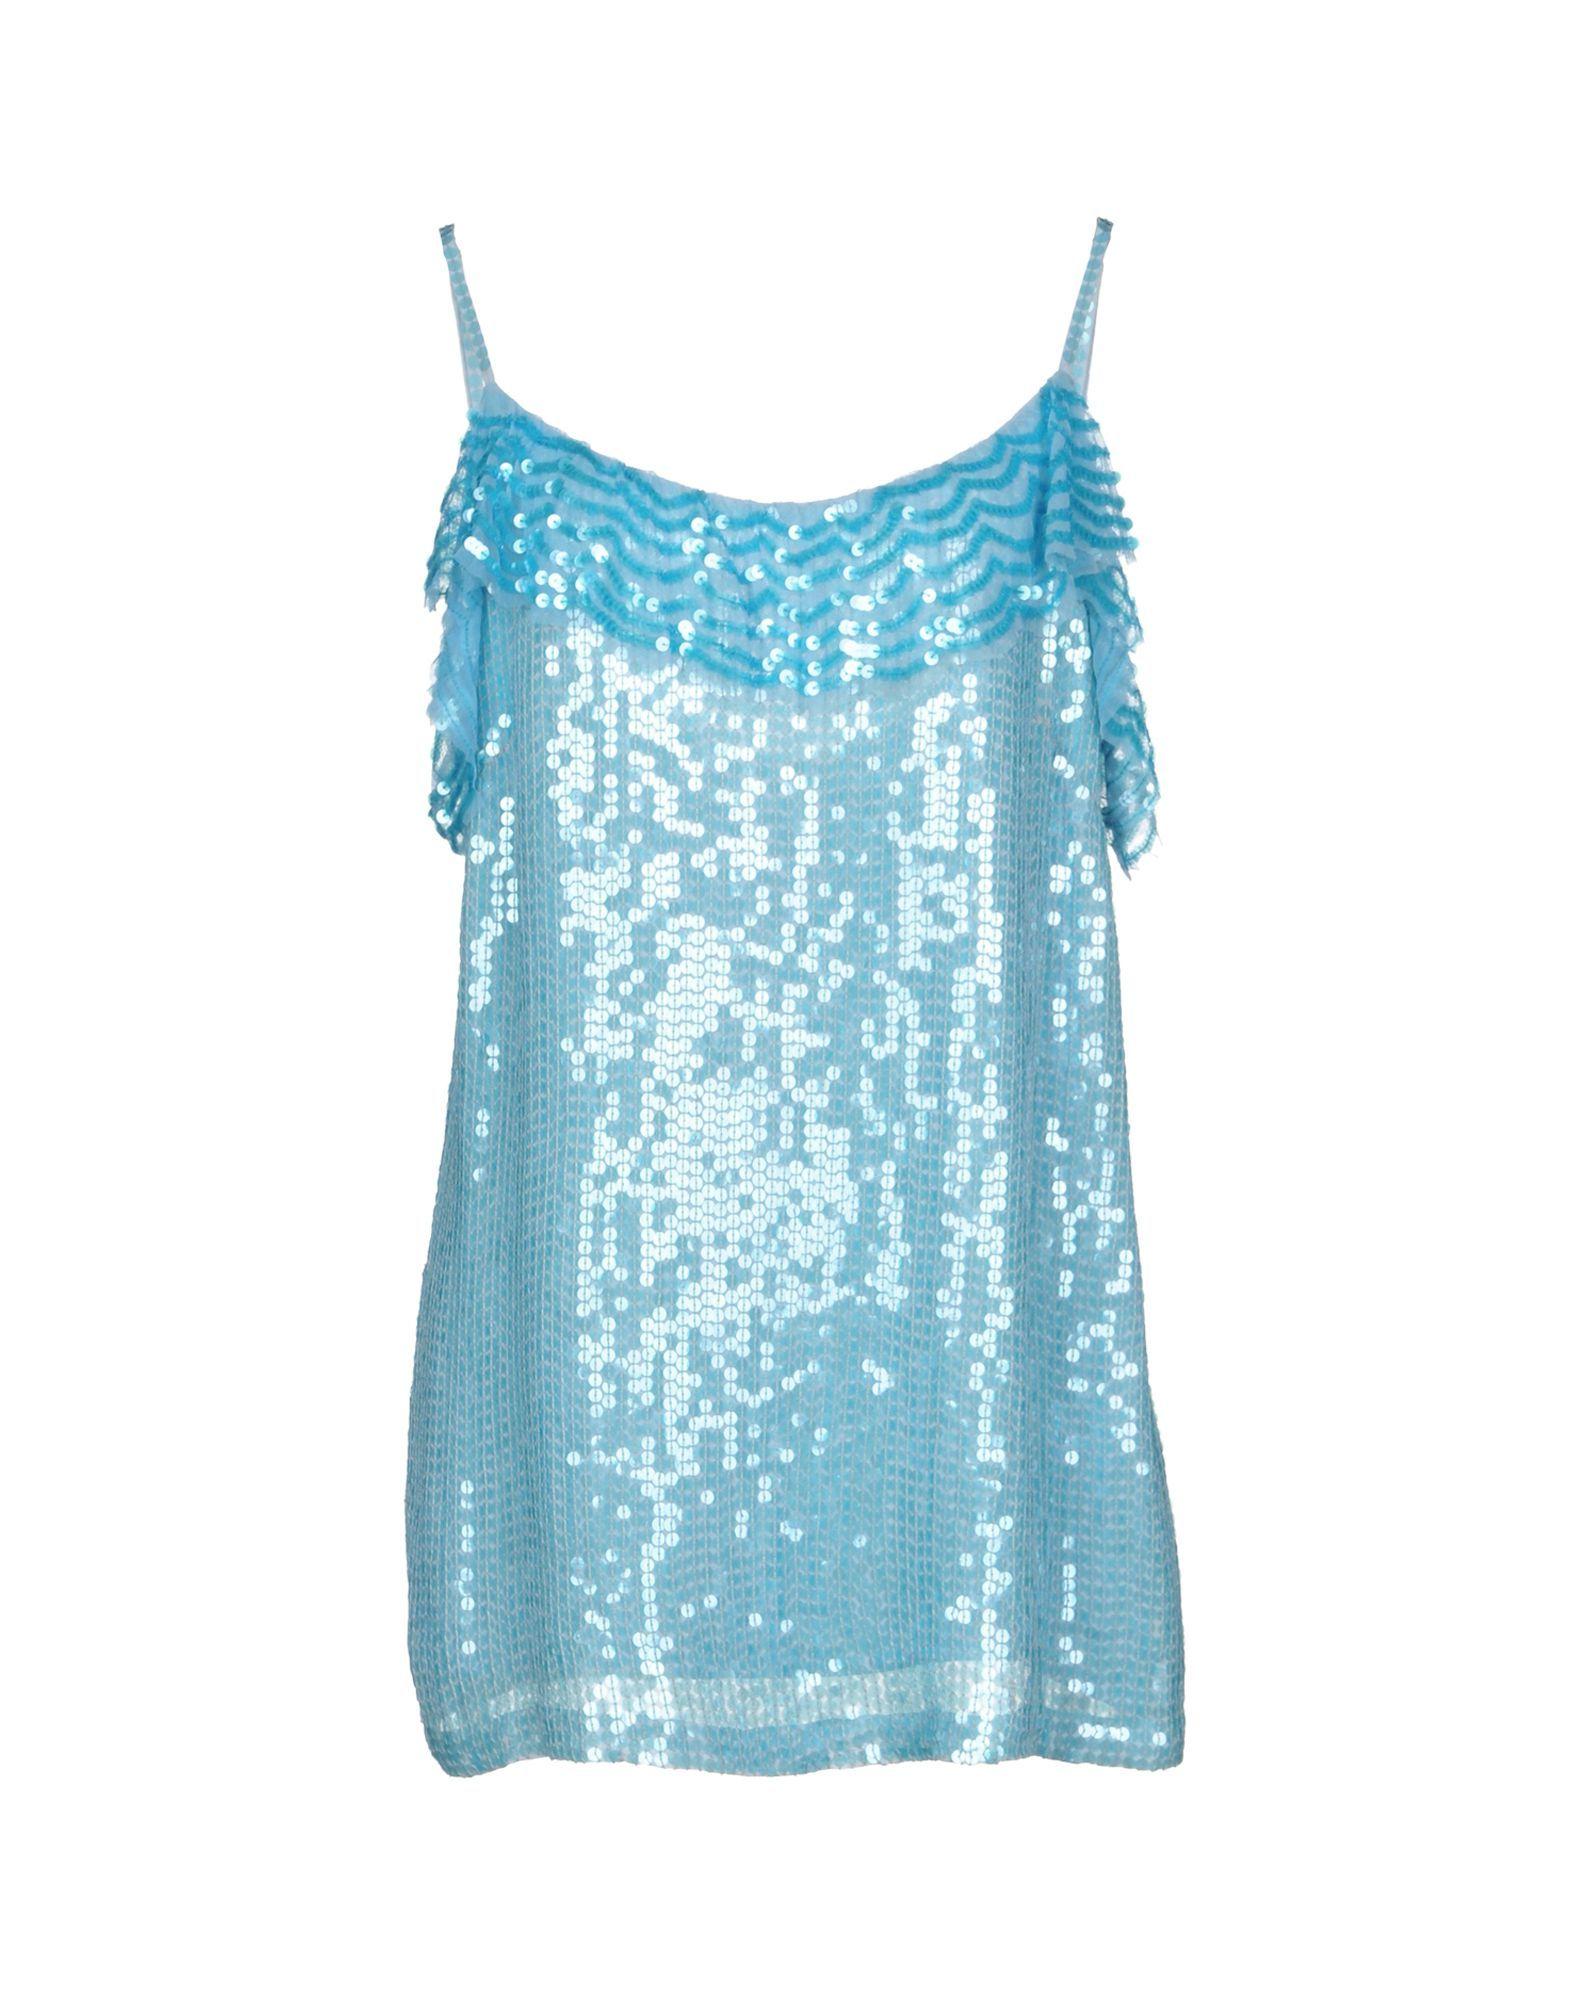 P.A.R.O.S.H. Sky Blue Sequin Camisole